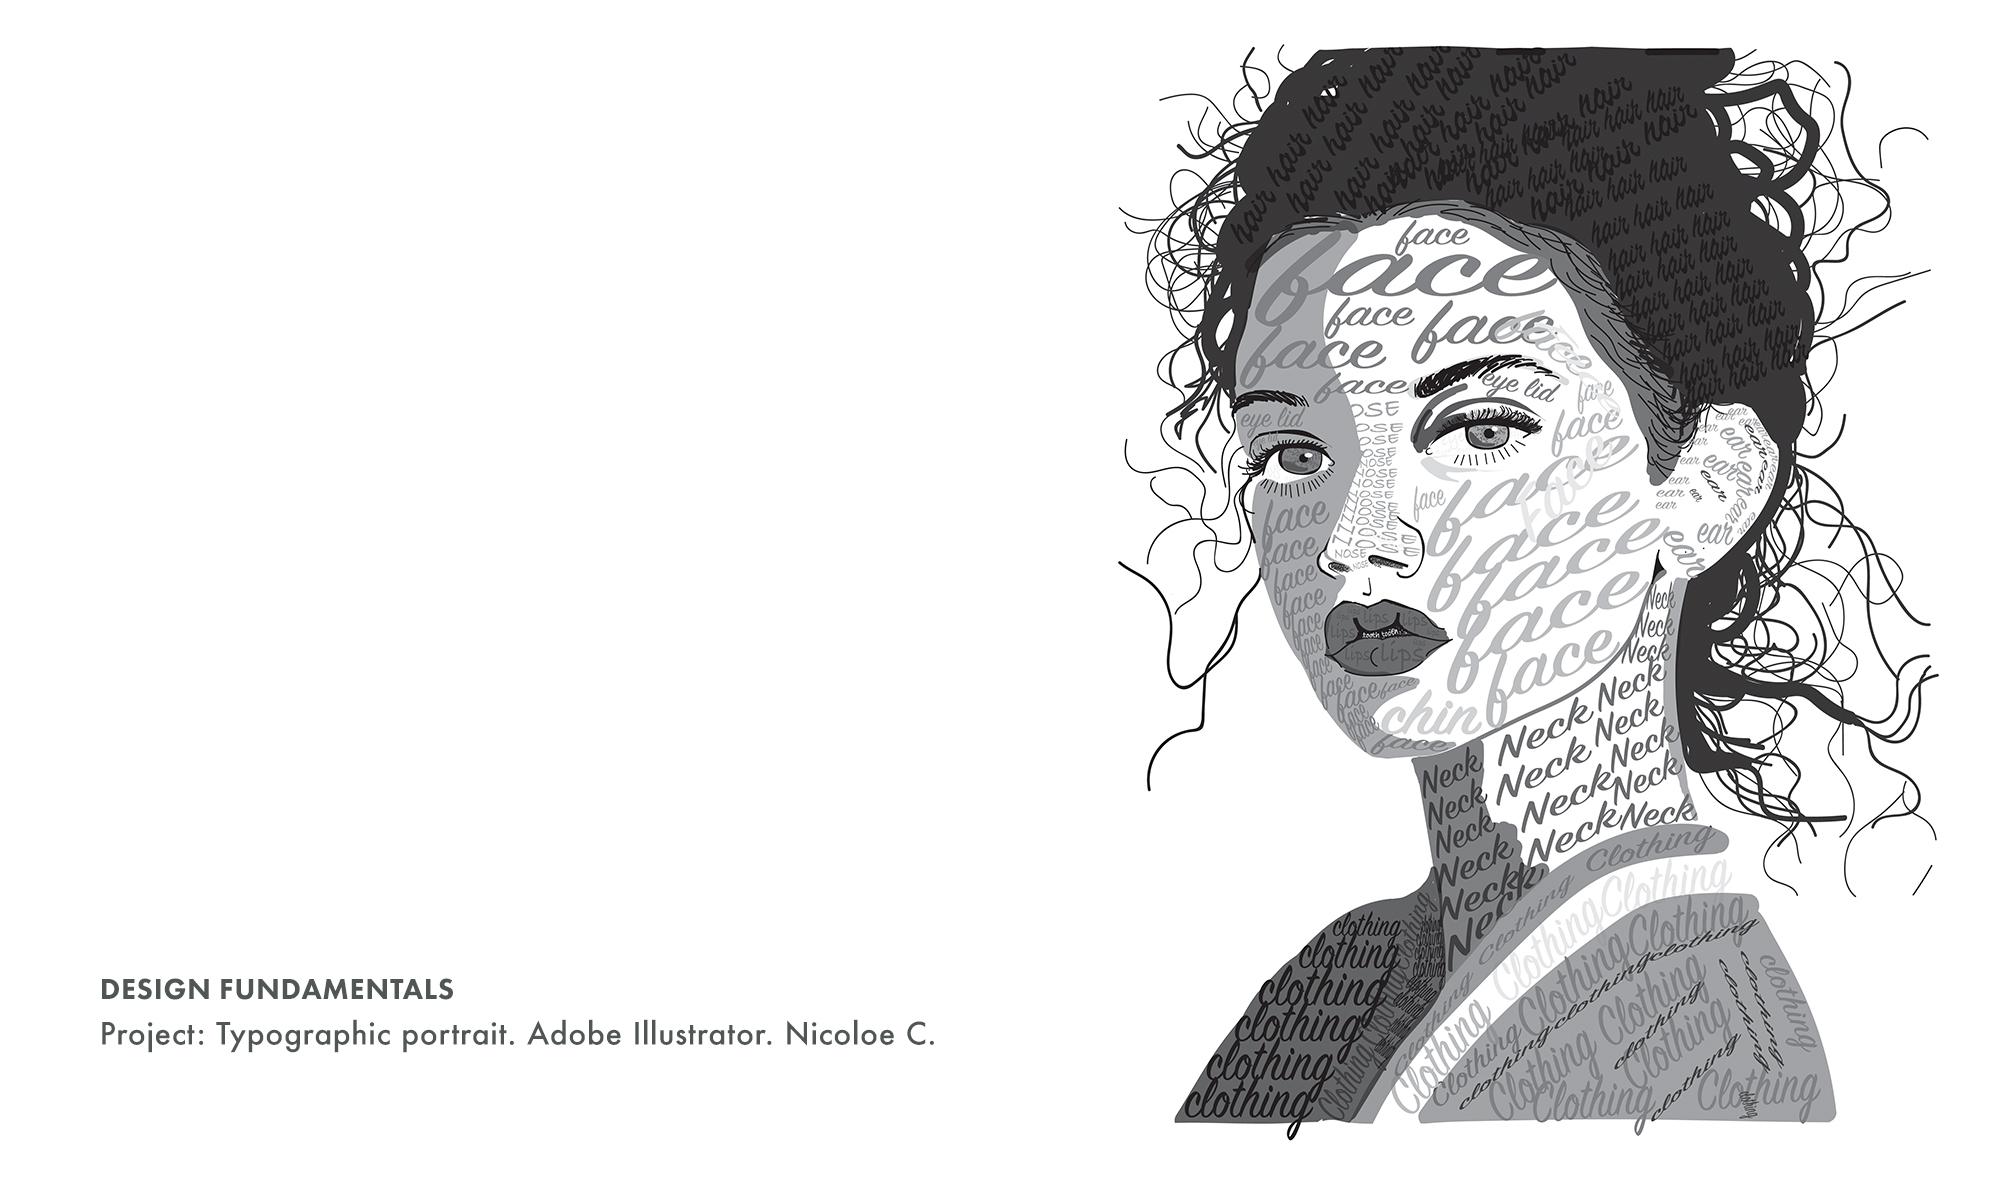 student work: Professor Victoria Martin. Palm Beach State College, Art and Graphic Design